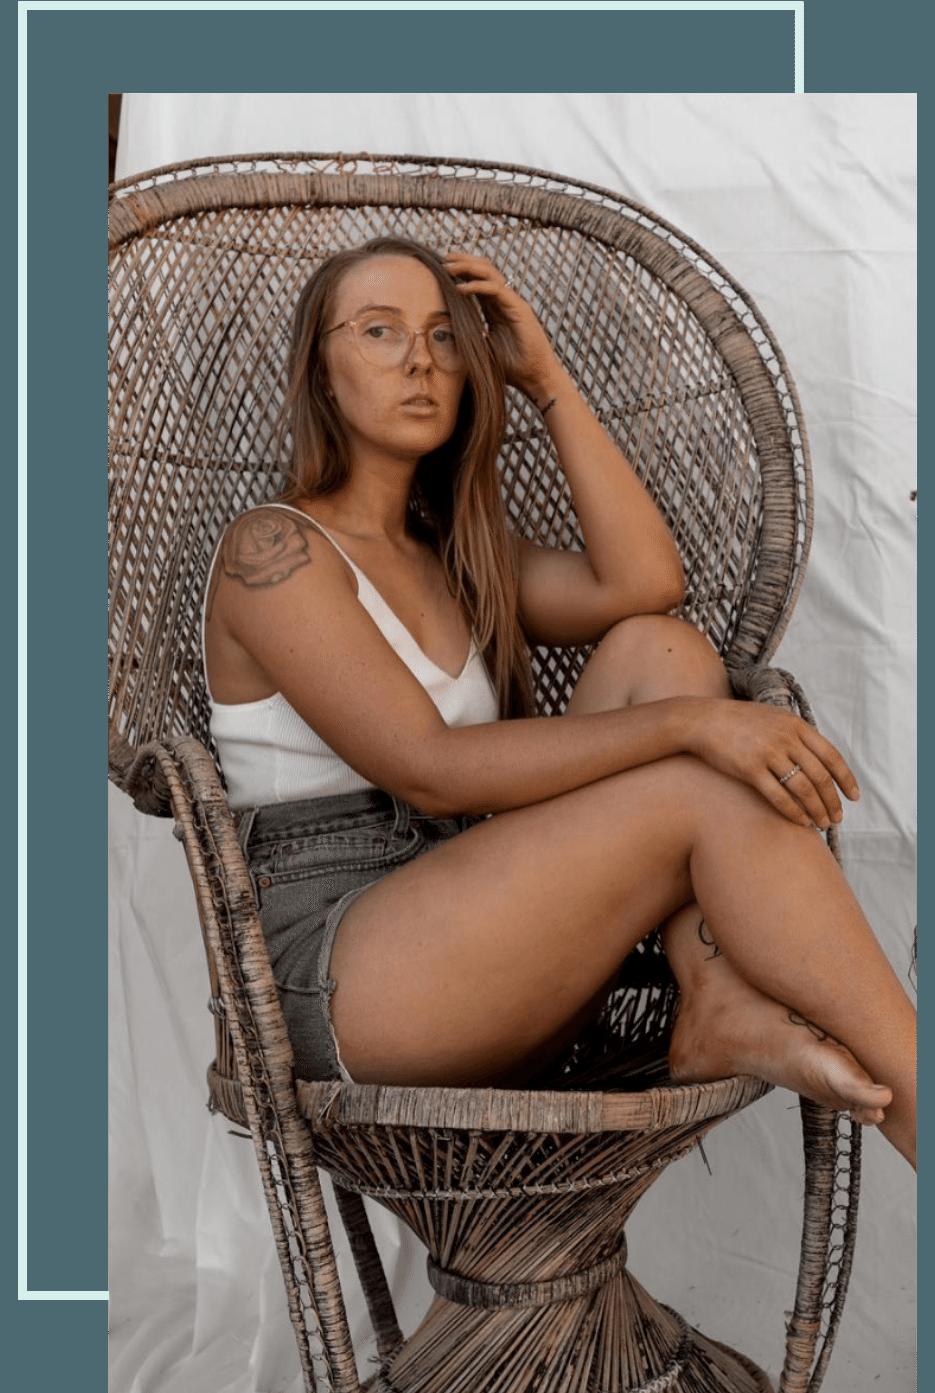 Mee Miranda - testimonial